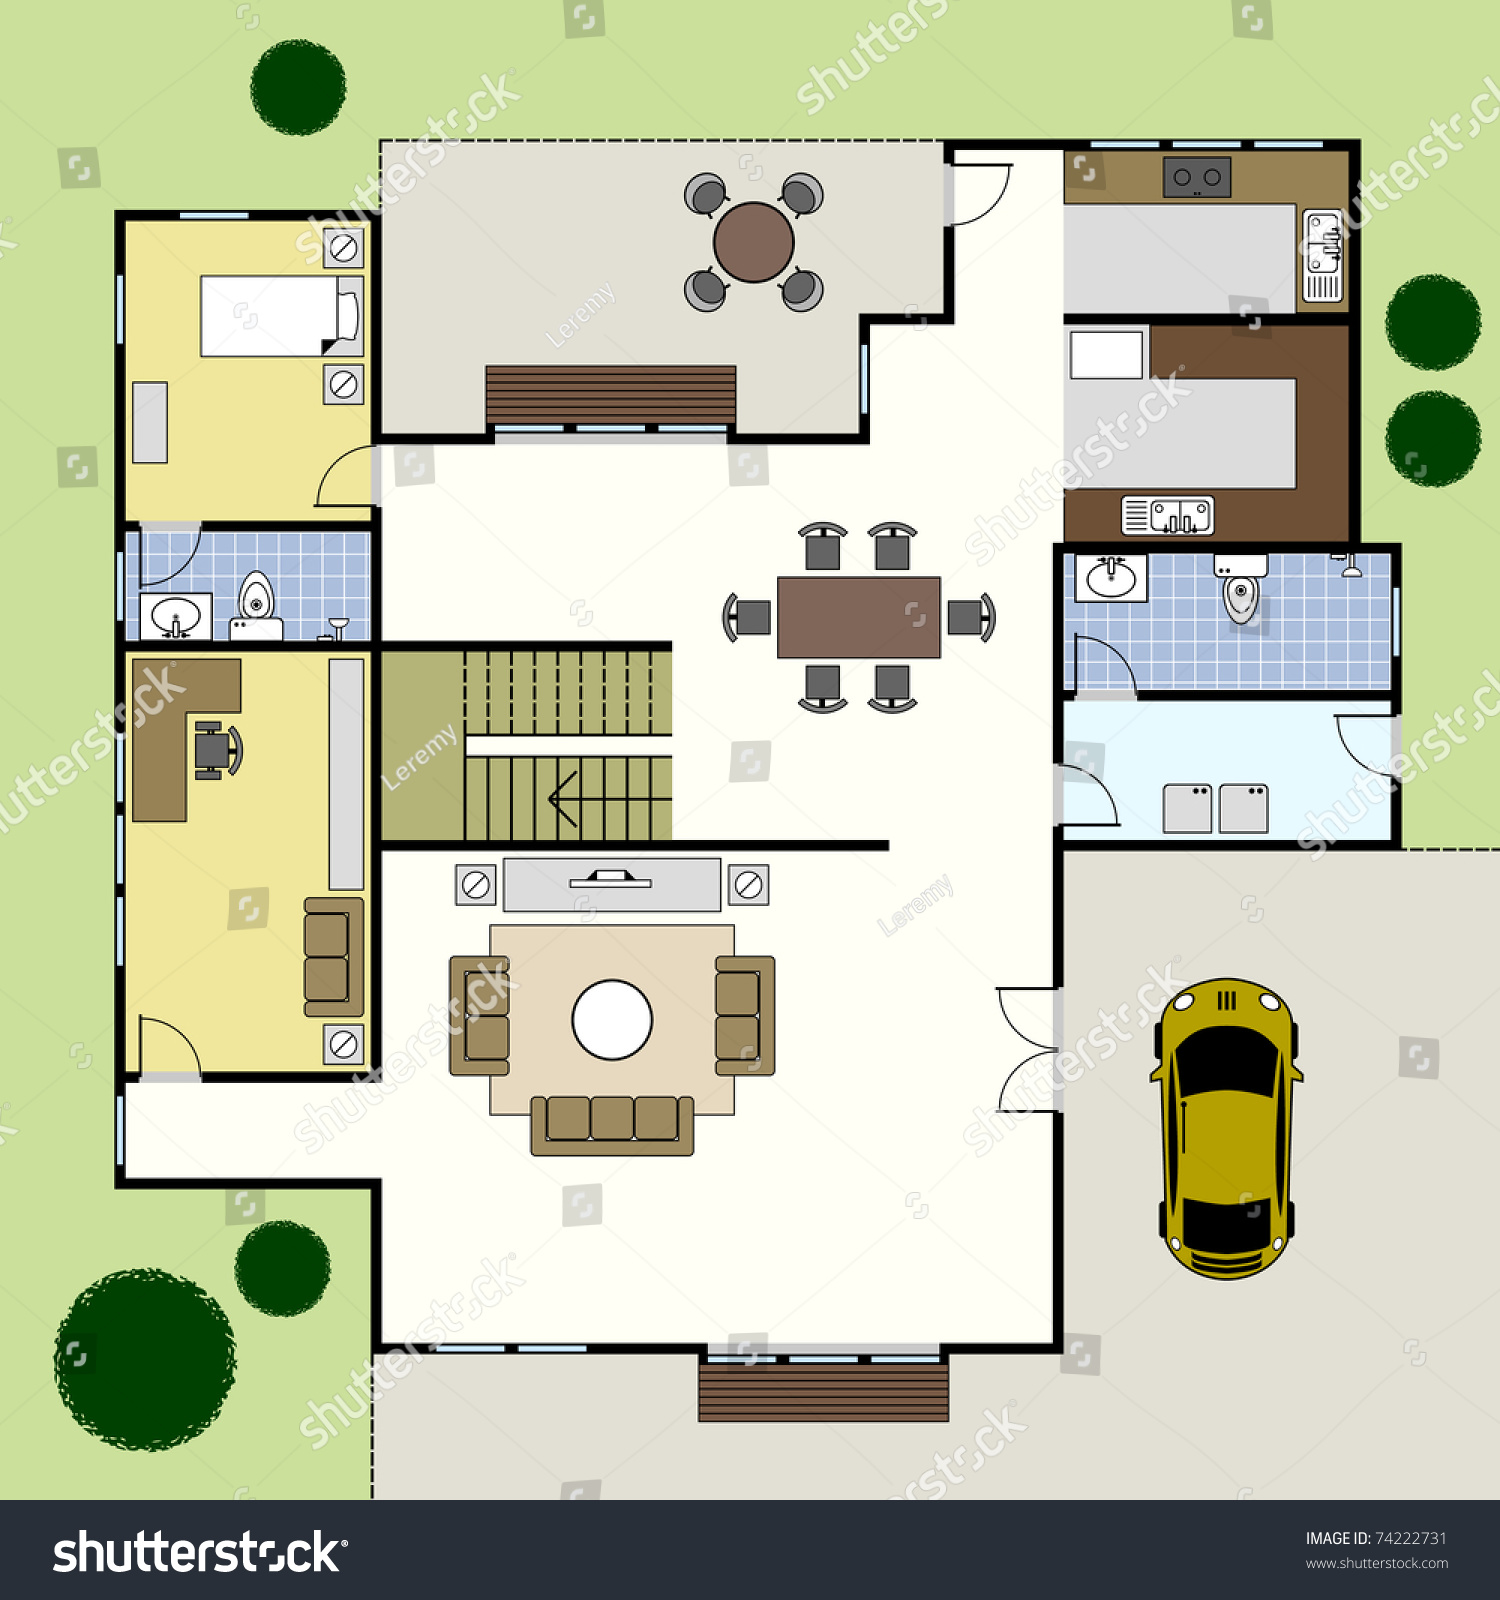 Ground Floor Plan Floorplan House Home Illustration 74222731 – Free Floor Plans For Building A House